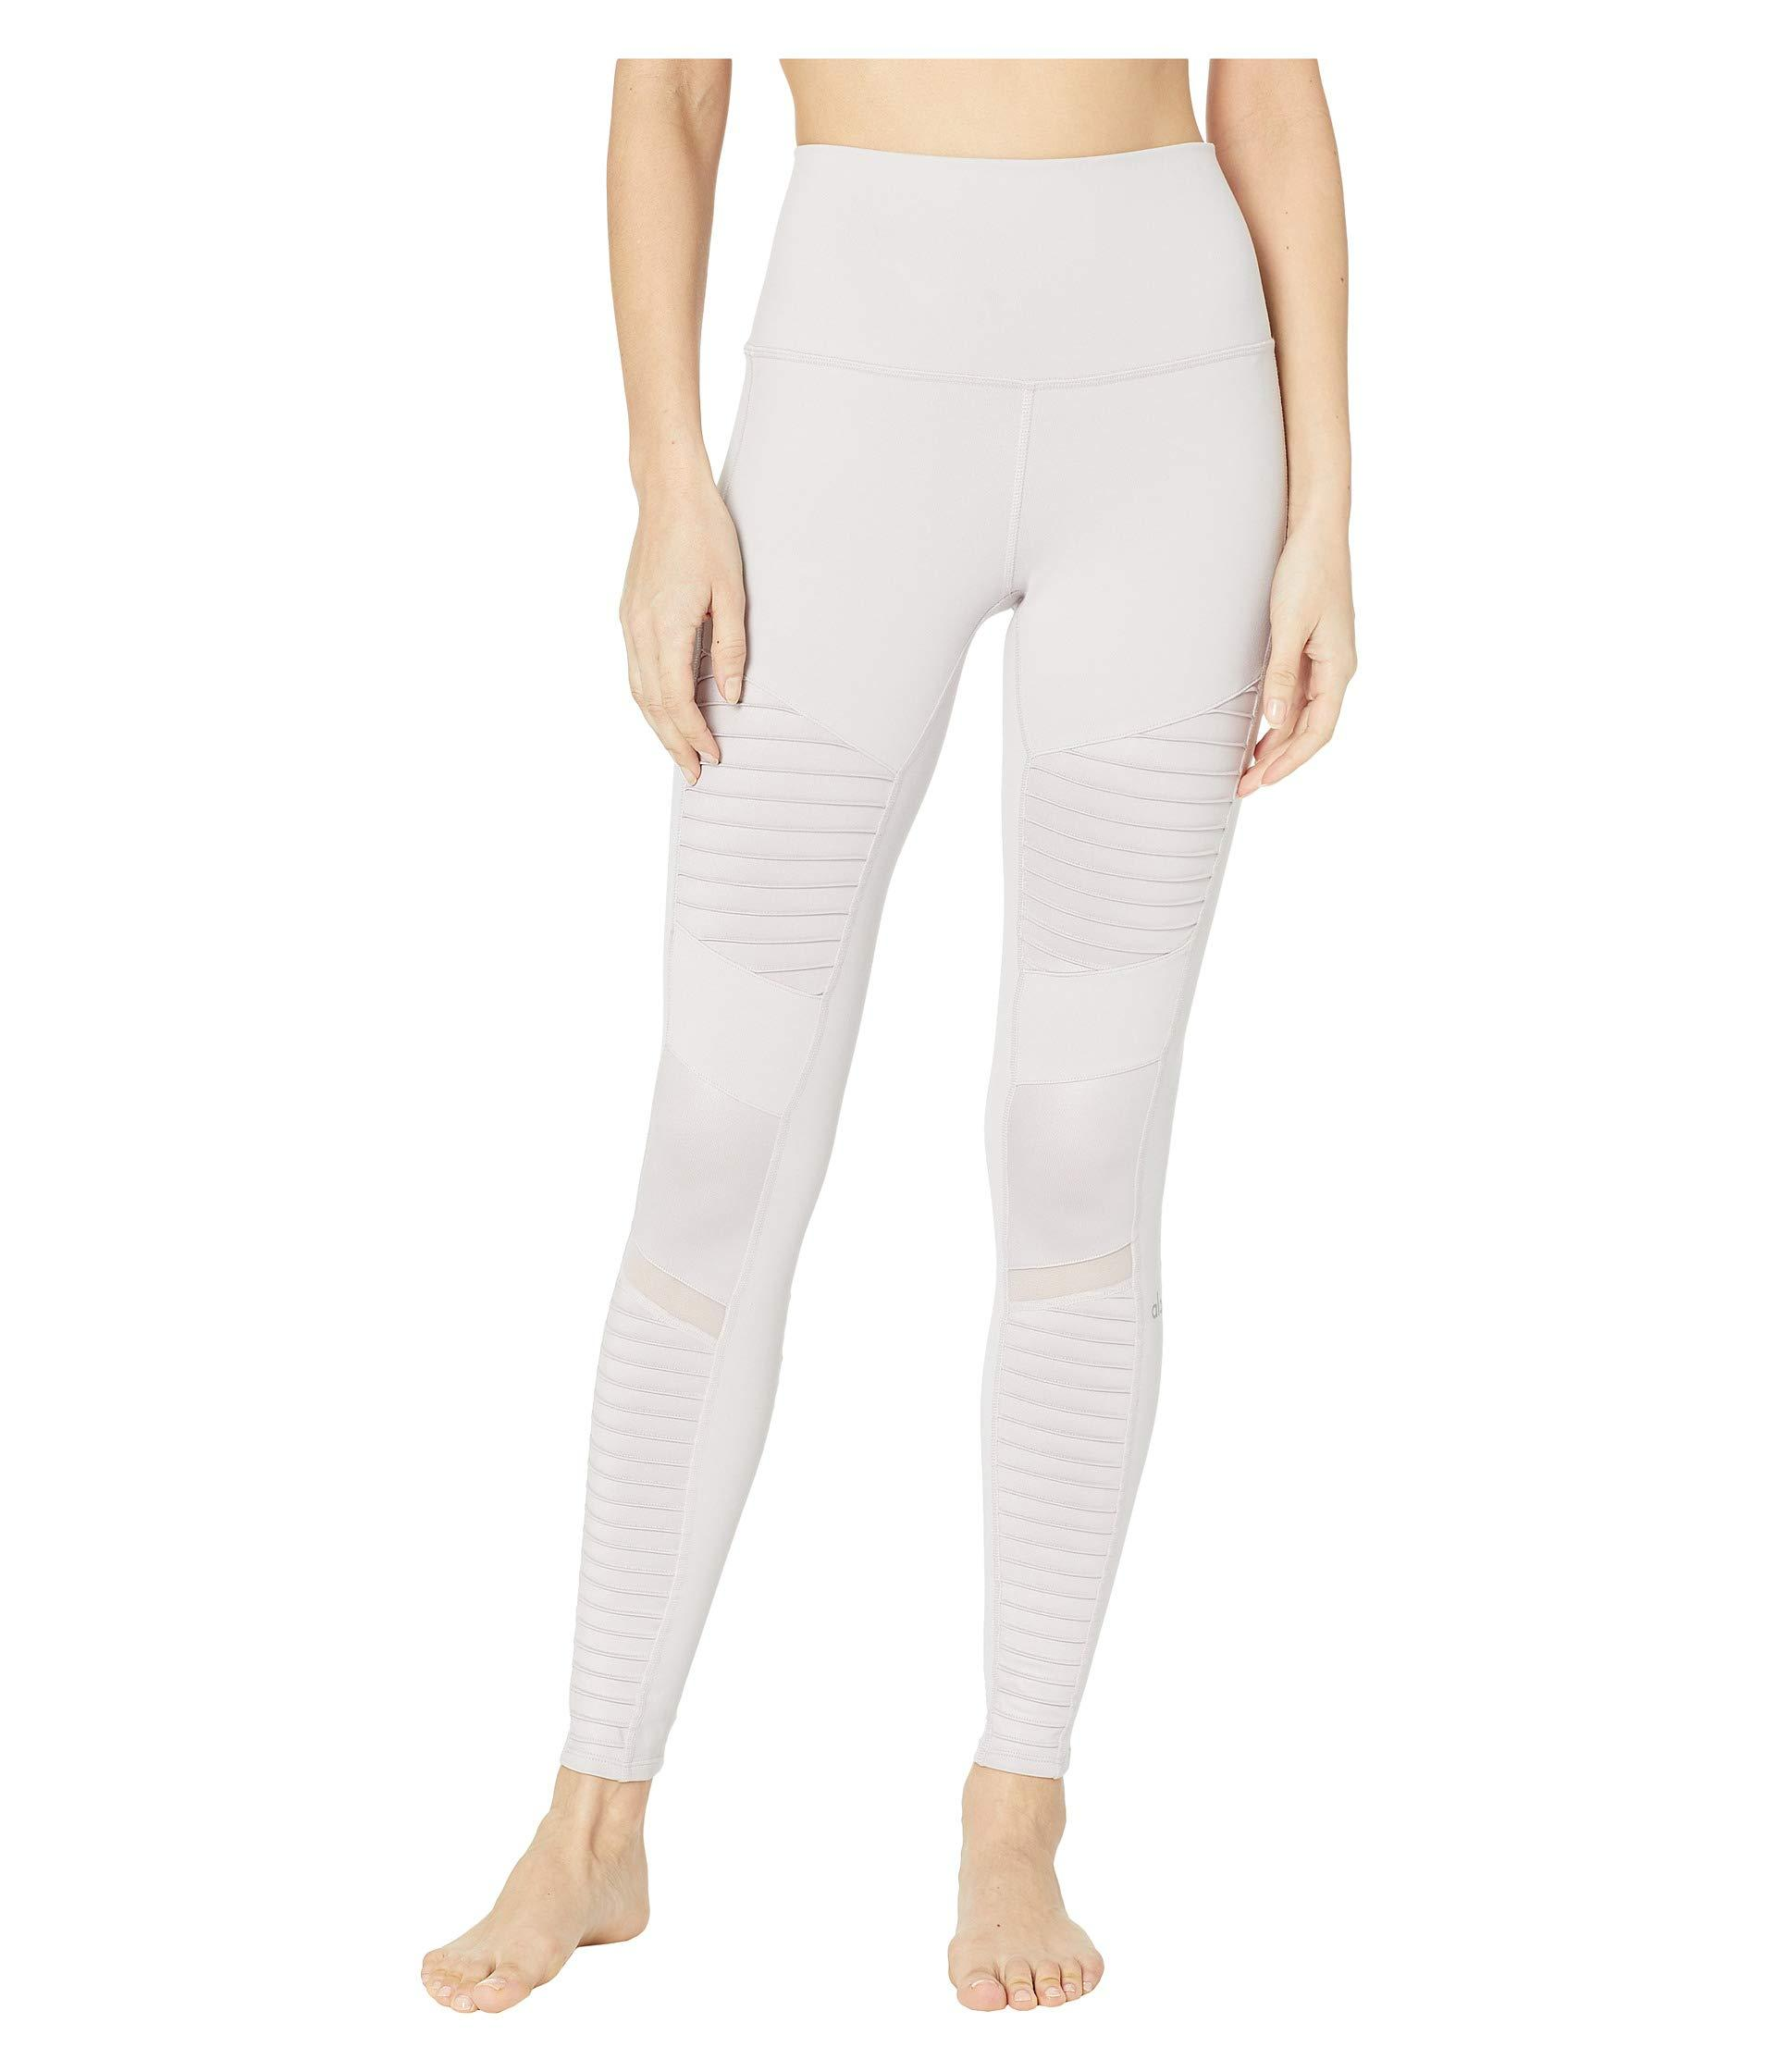 77c3ab8dae Alo Yoga. High Waisted Moto Leggings (pristine/pristine Glossy) Women's  Workout